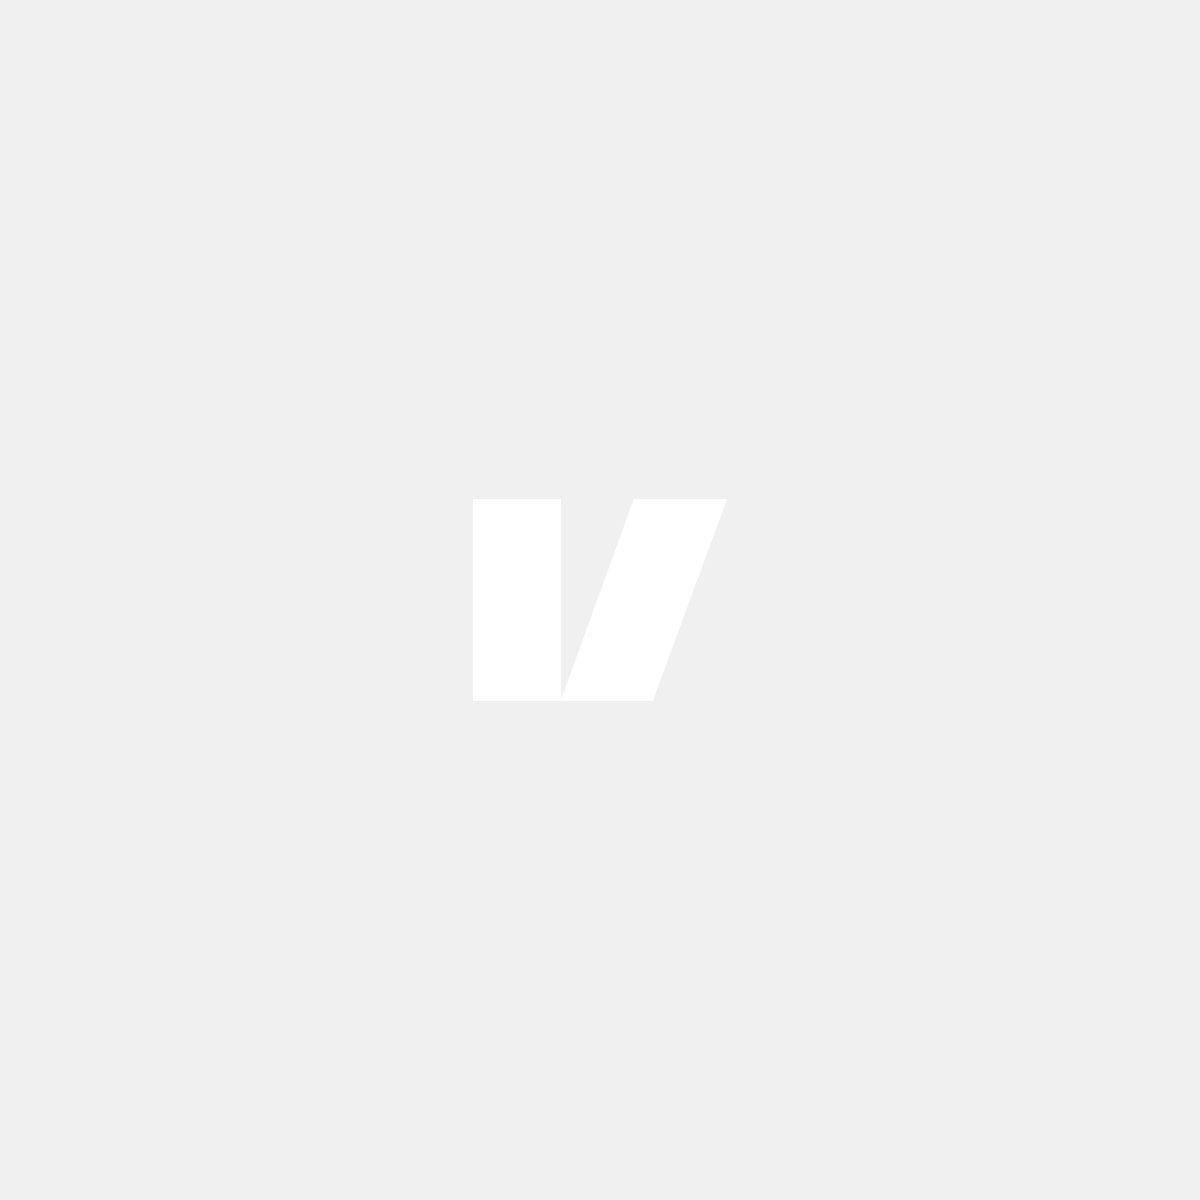 Kolfibervinge stylingmodell till Volvo V70, XC70 00-07